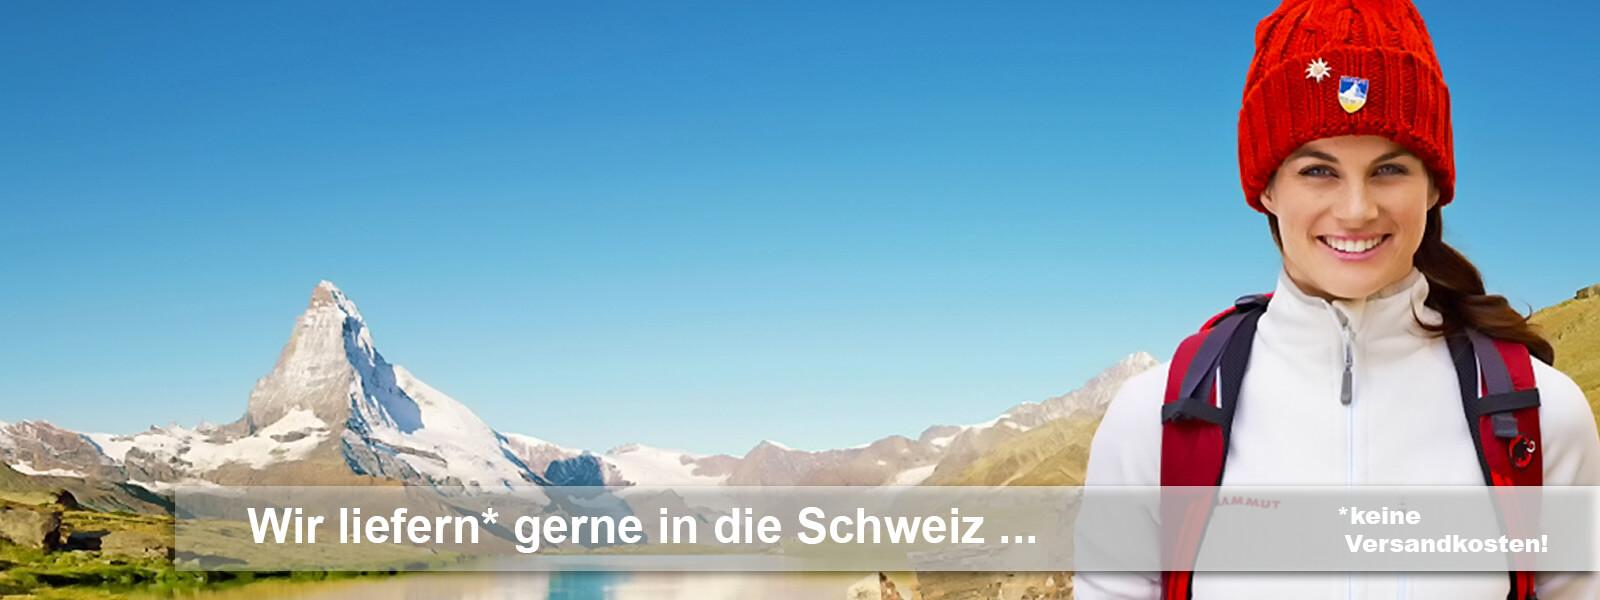 Brandstores Versand in die Schweiz